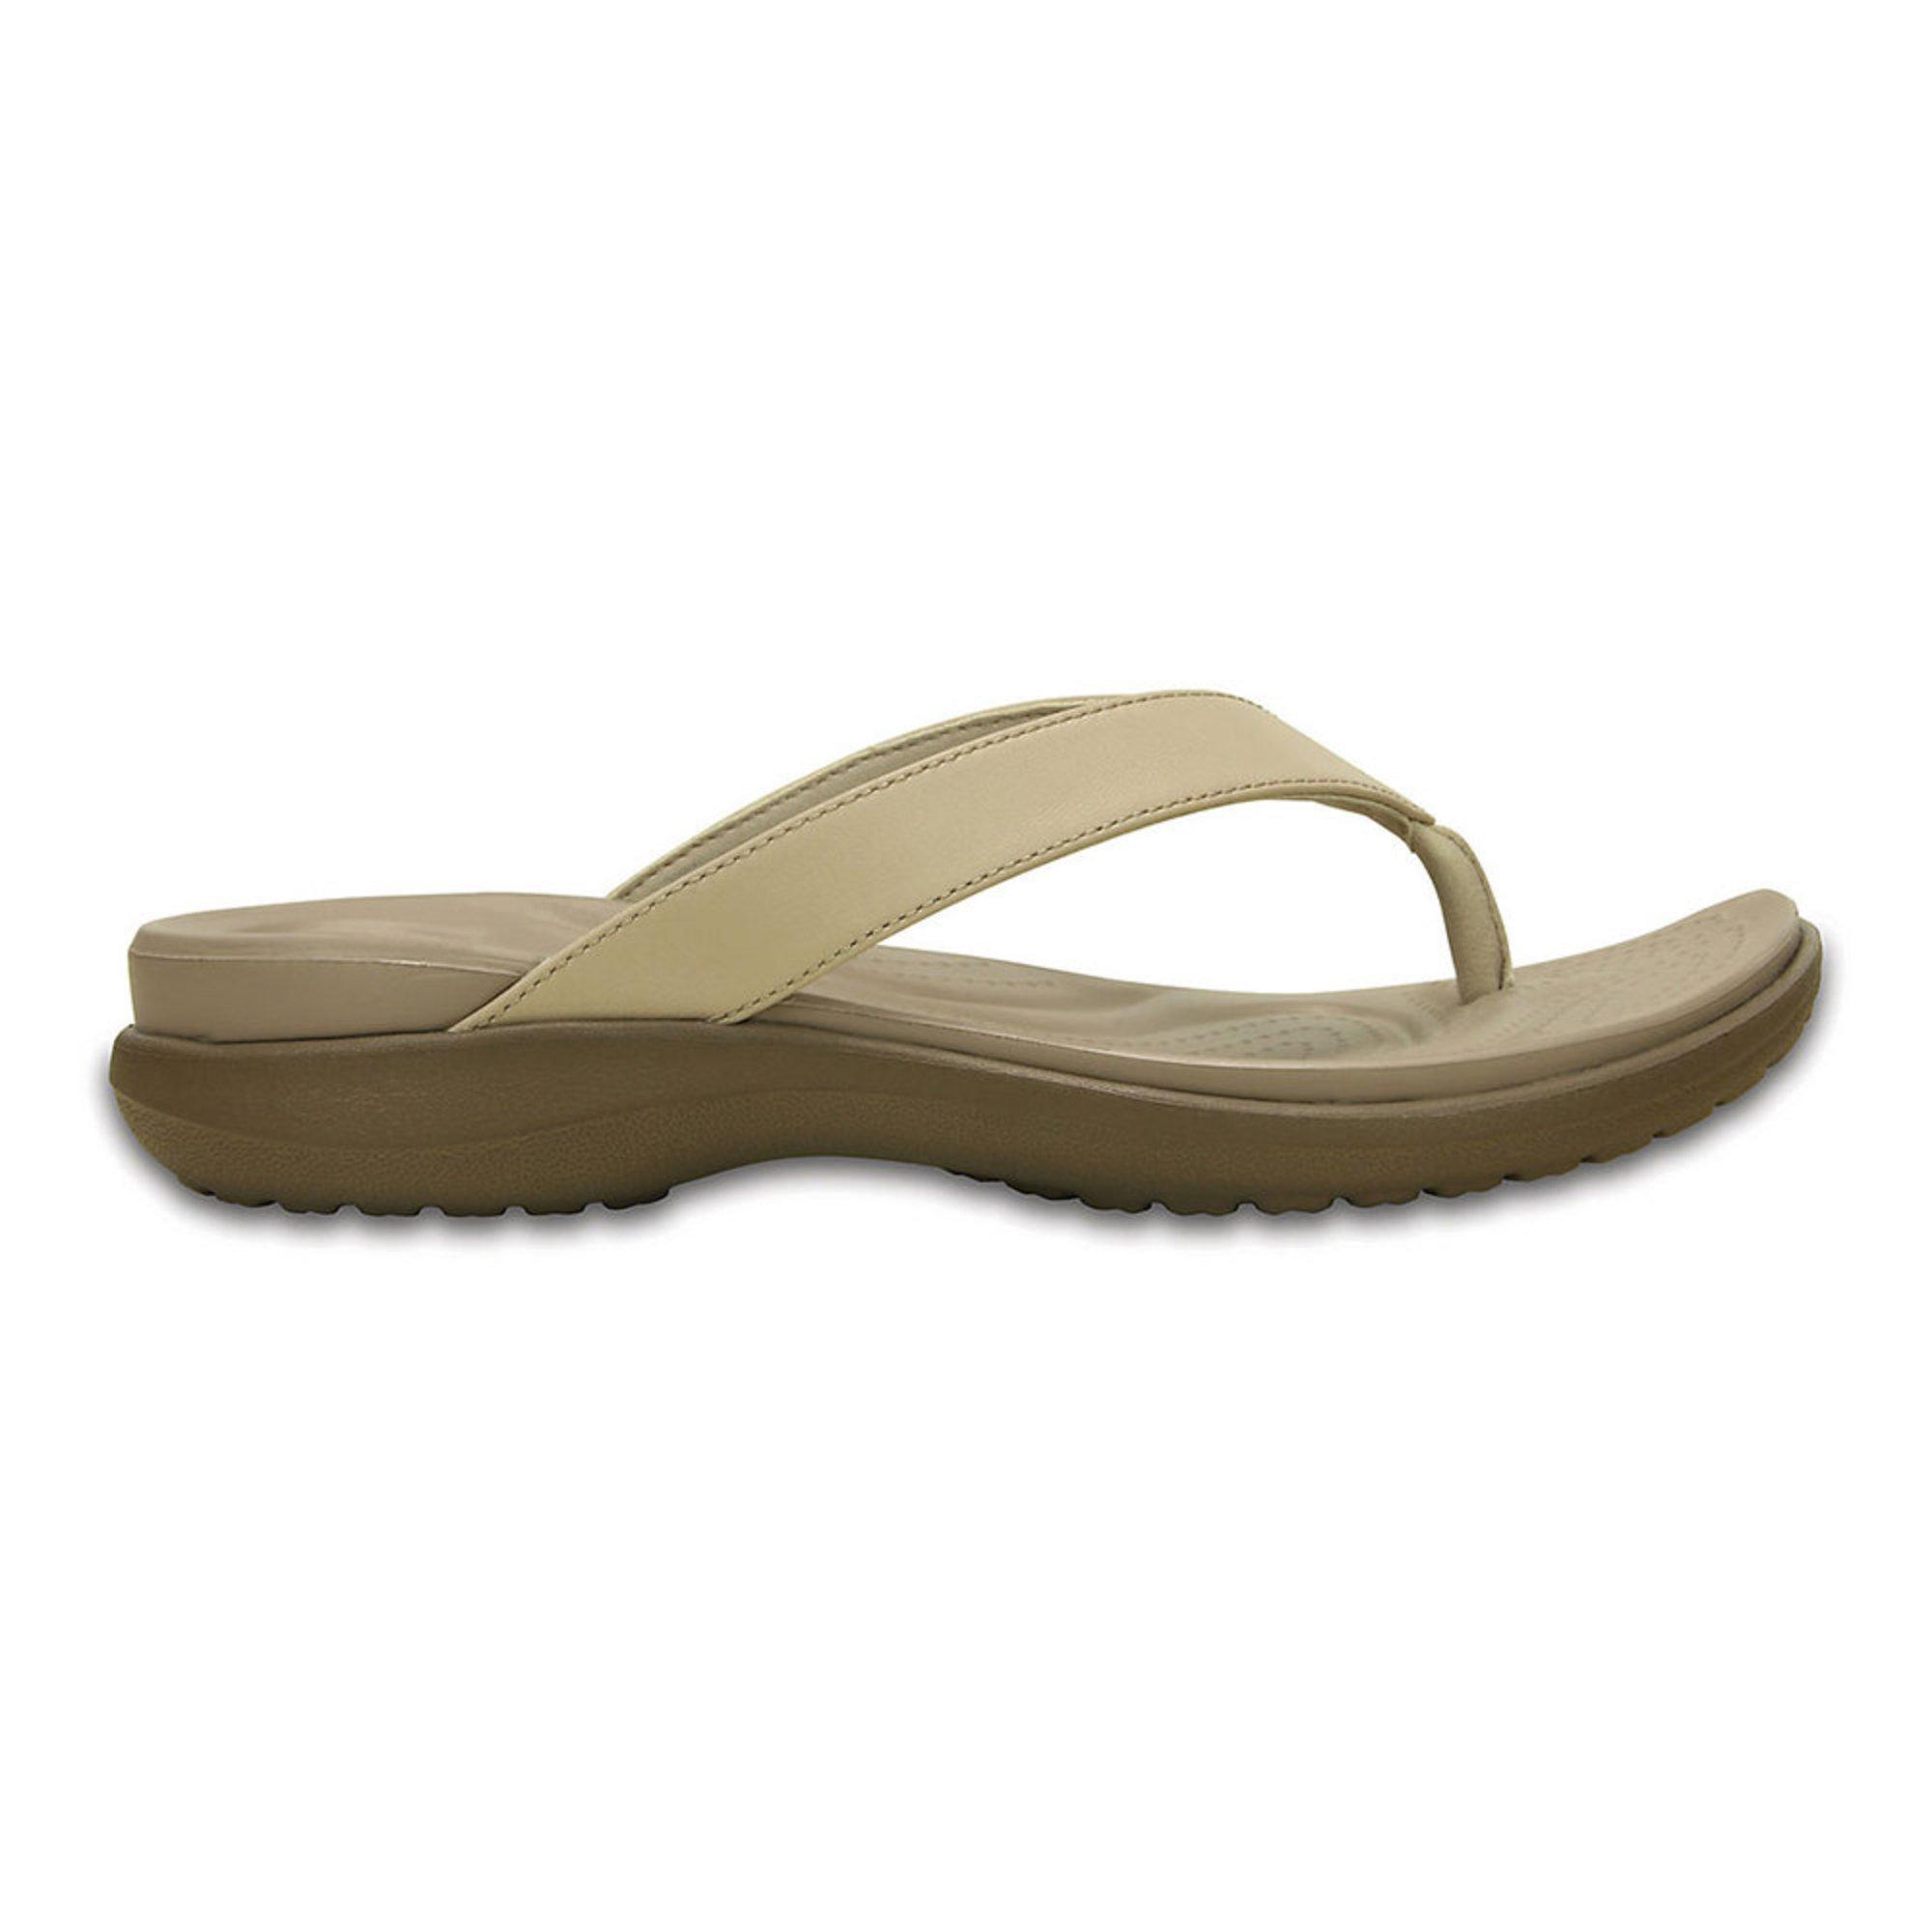 9283cff03 Crocs Women's Capri Flip Wedge | Women's Sandals | Shoes - Shop Your ...